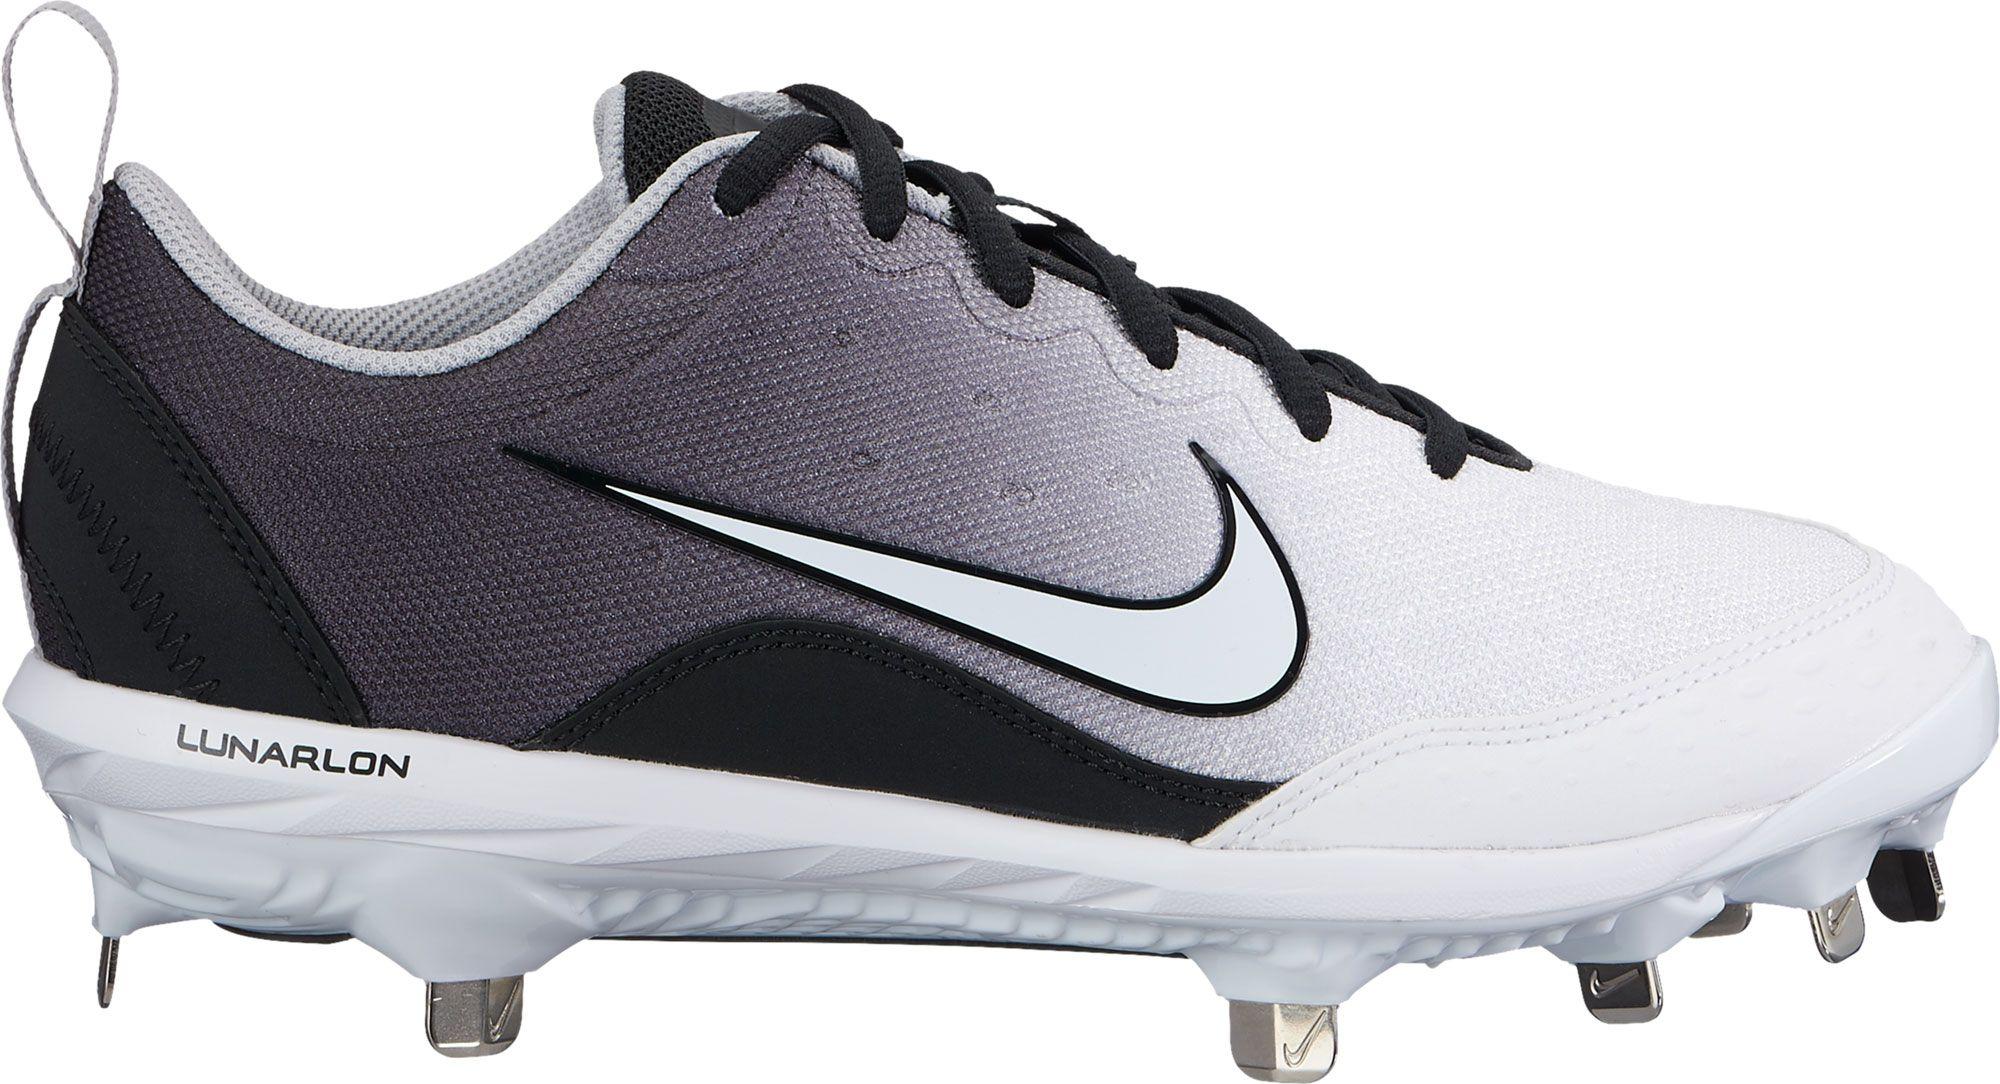 Nike Women's Lunar Hyperdiamond 2 Pro Fastpitch Softball Cleats | DICK'S  Sporting Goods